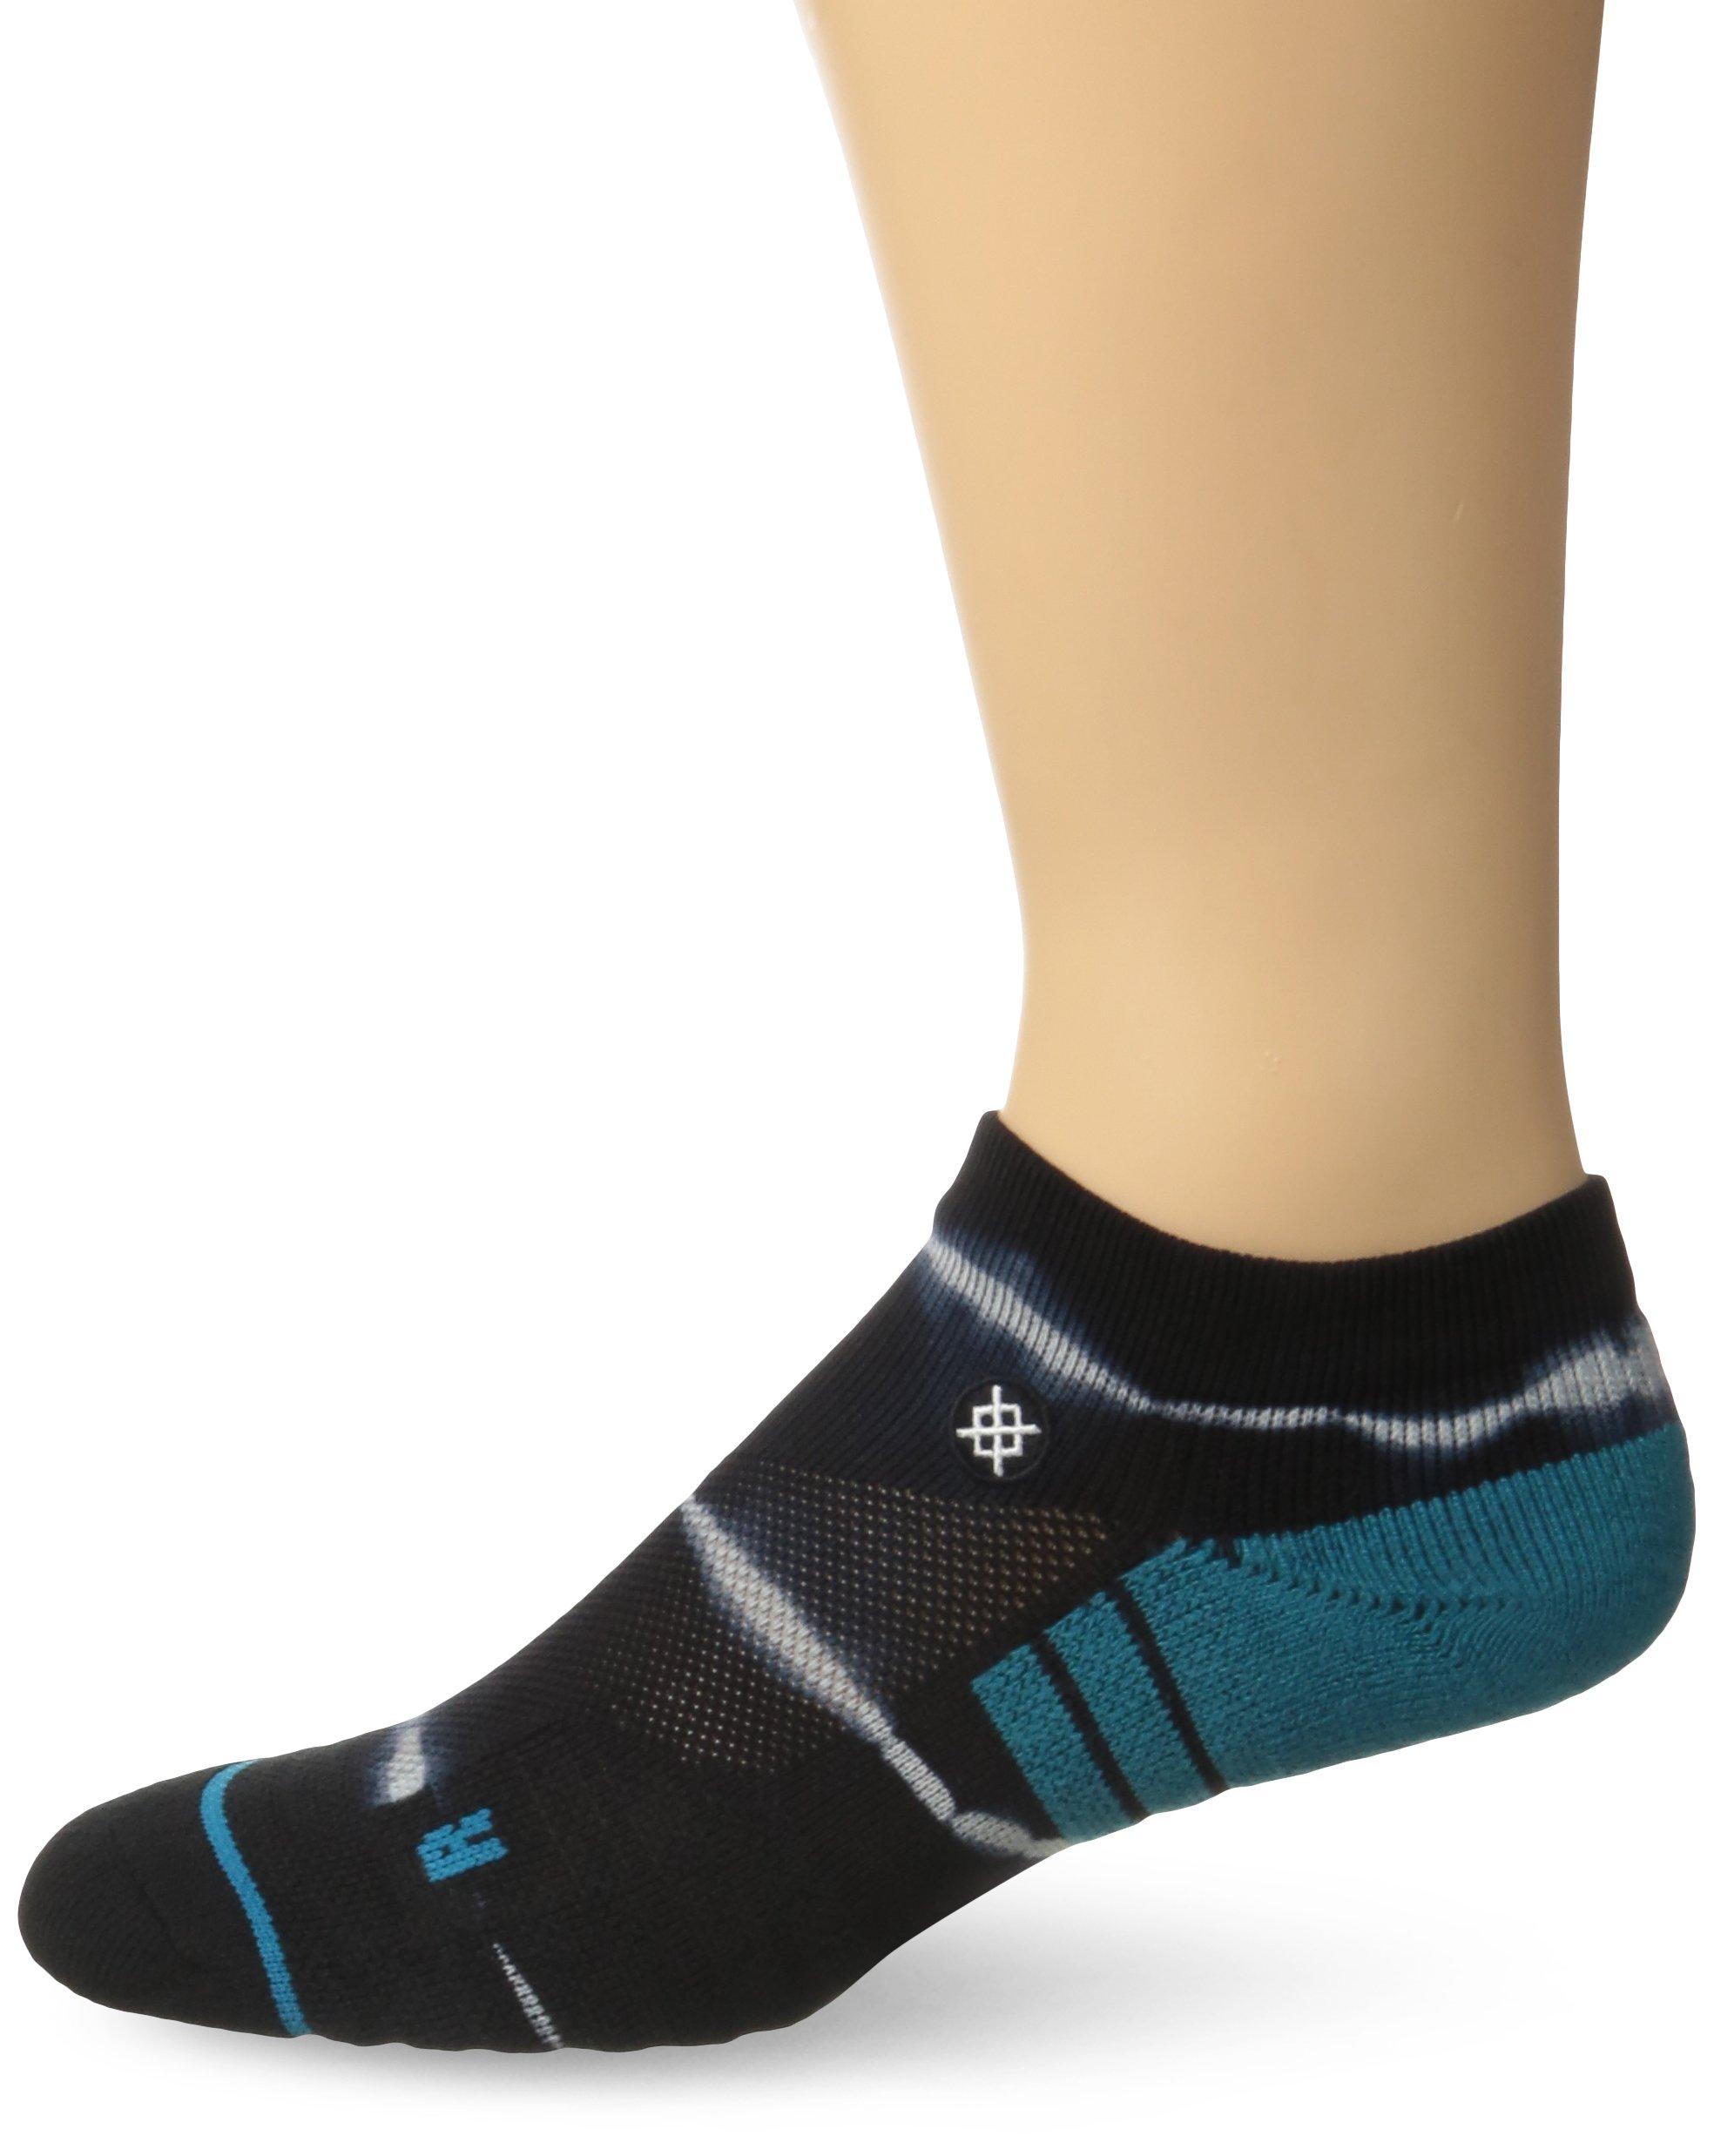 Stance Men's Richter Low Light Cushion Sock, Black, Sock Size:10-13/Shoe Size: 6-12